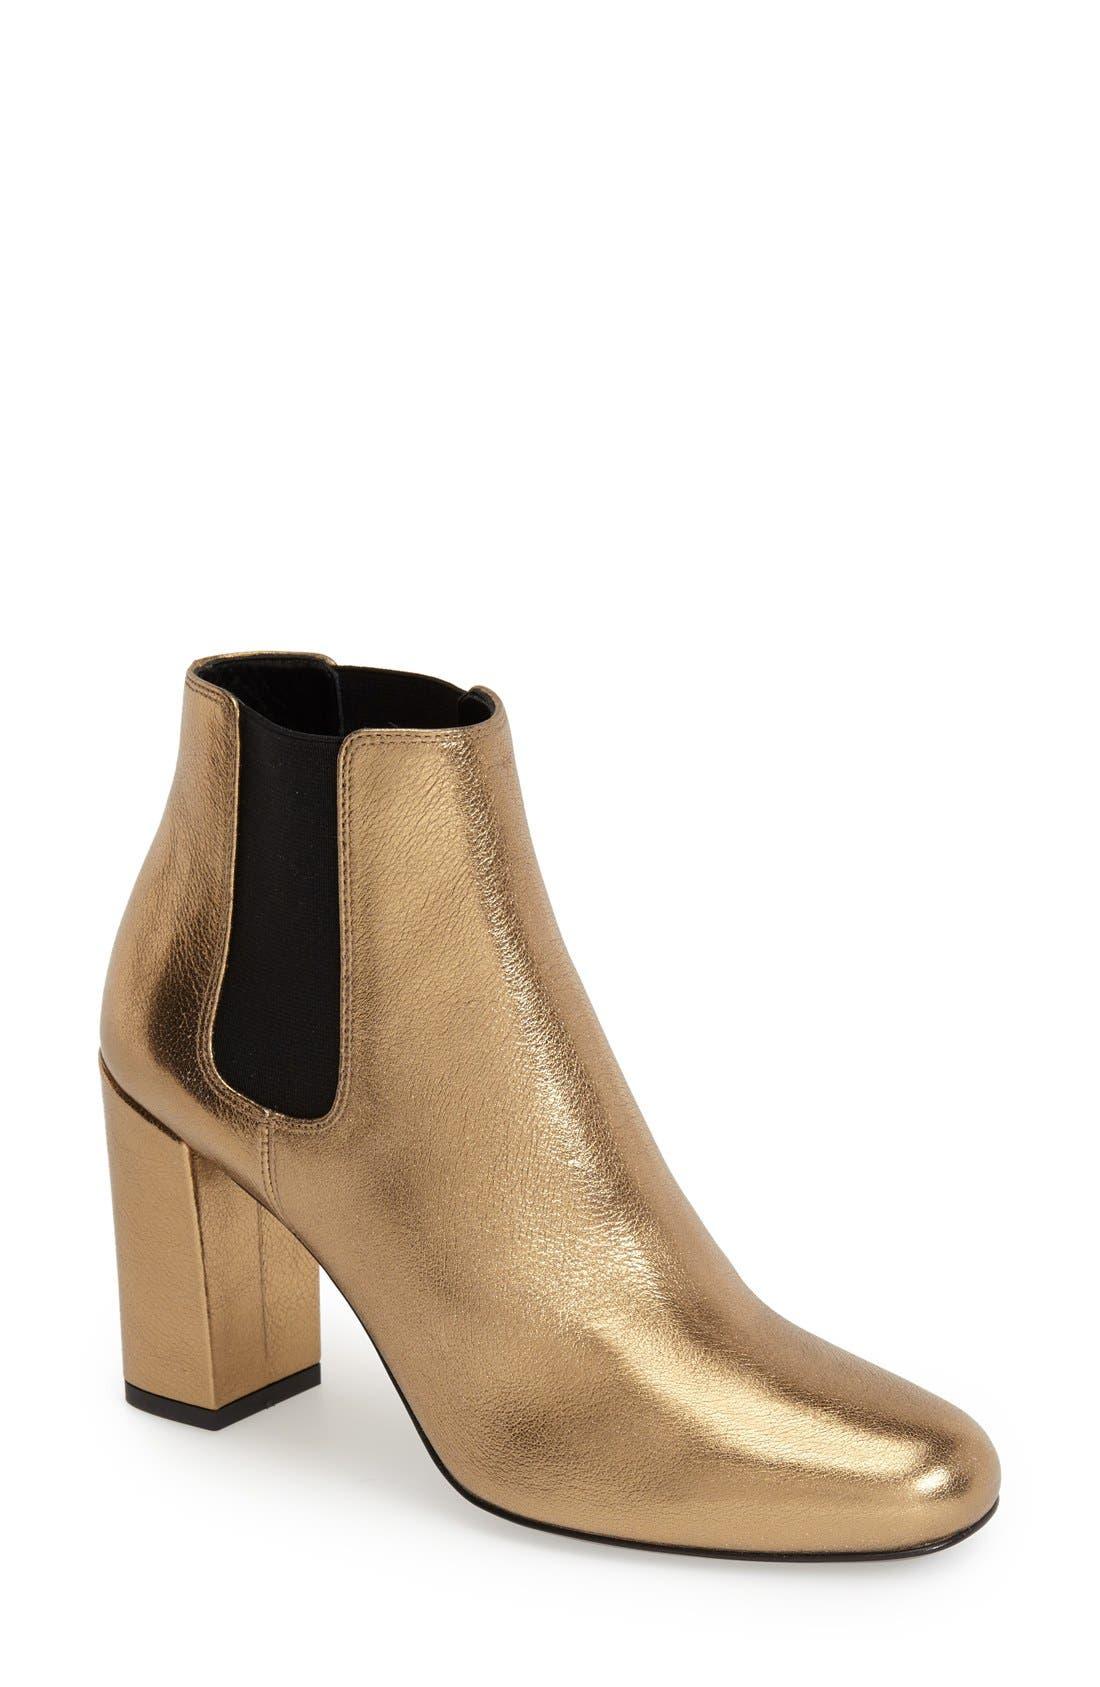 Alternate Image 1 Selected - Saint Laurent 'Babies' Chelsea Boot (Women)